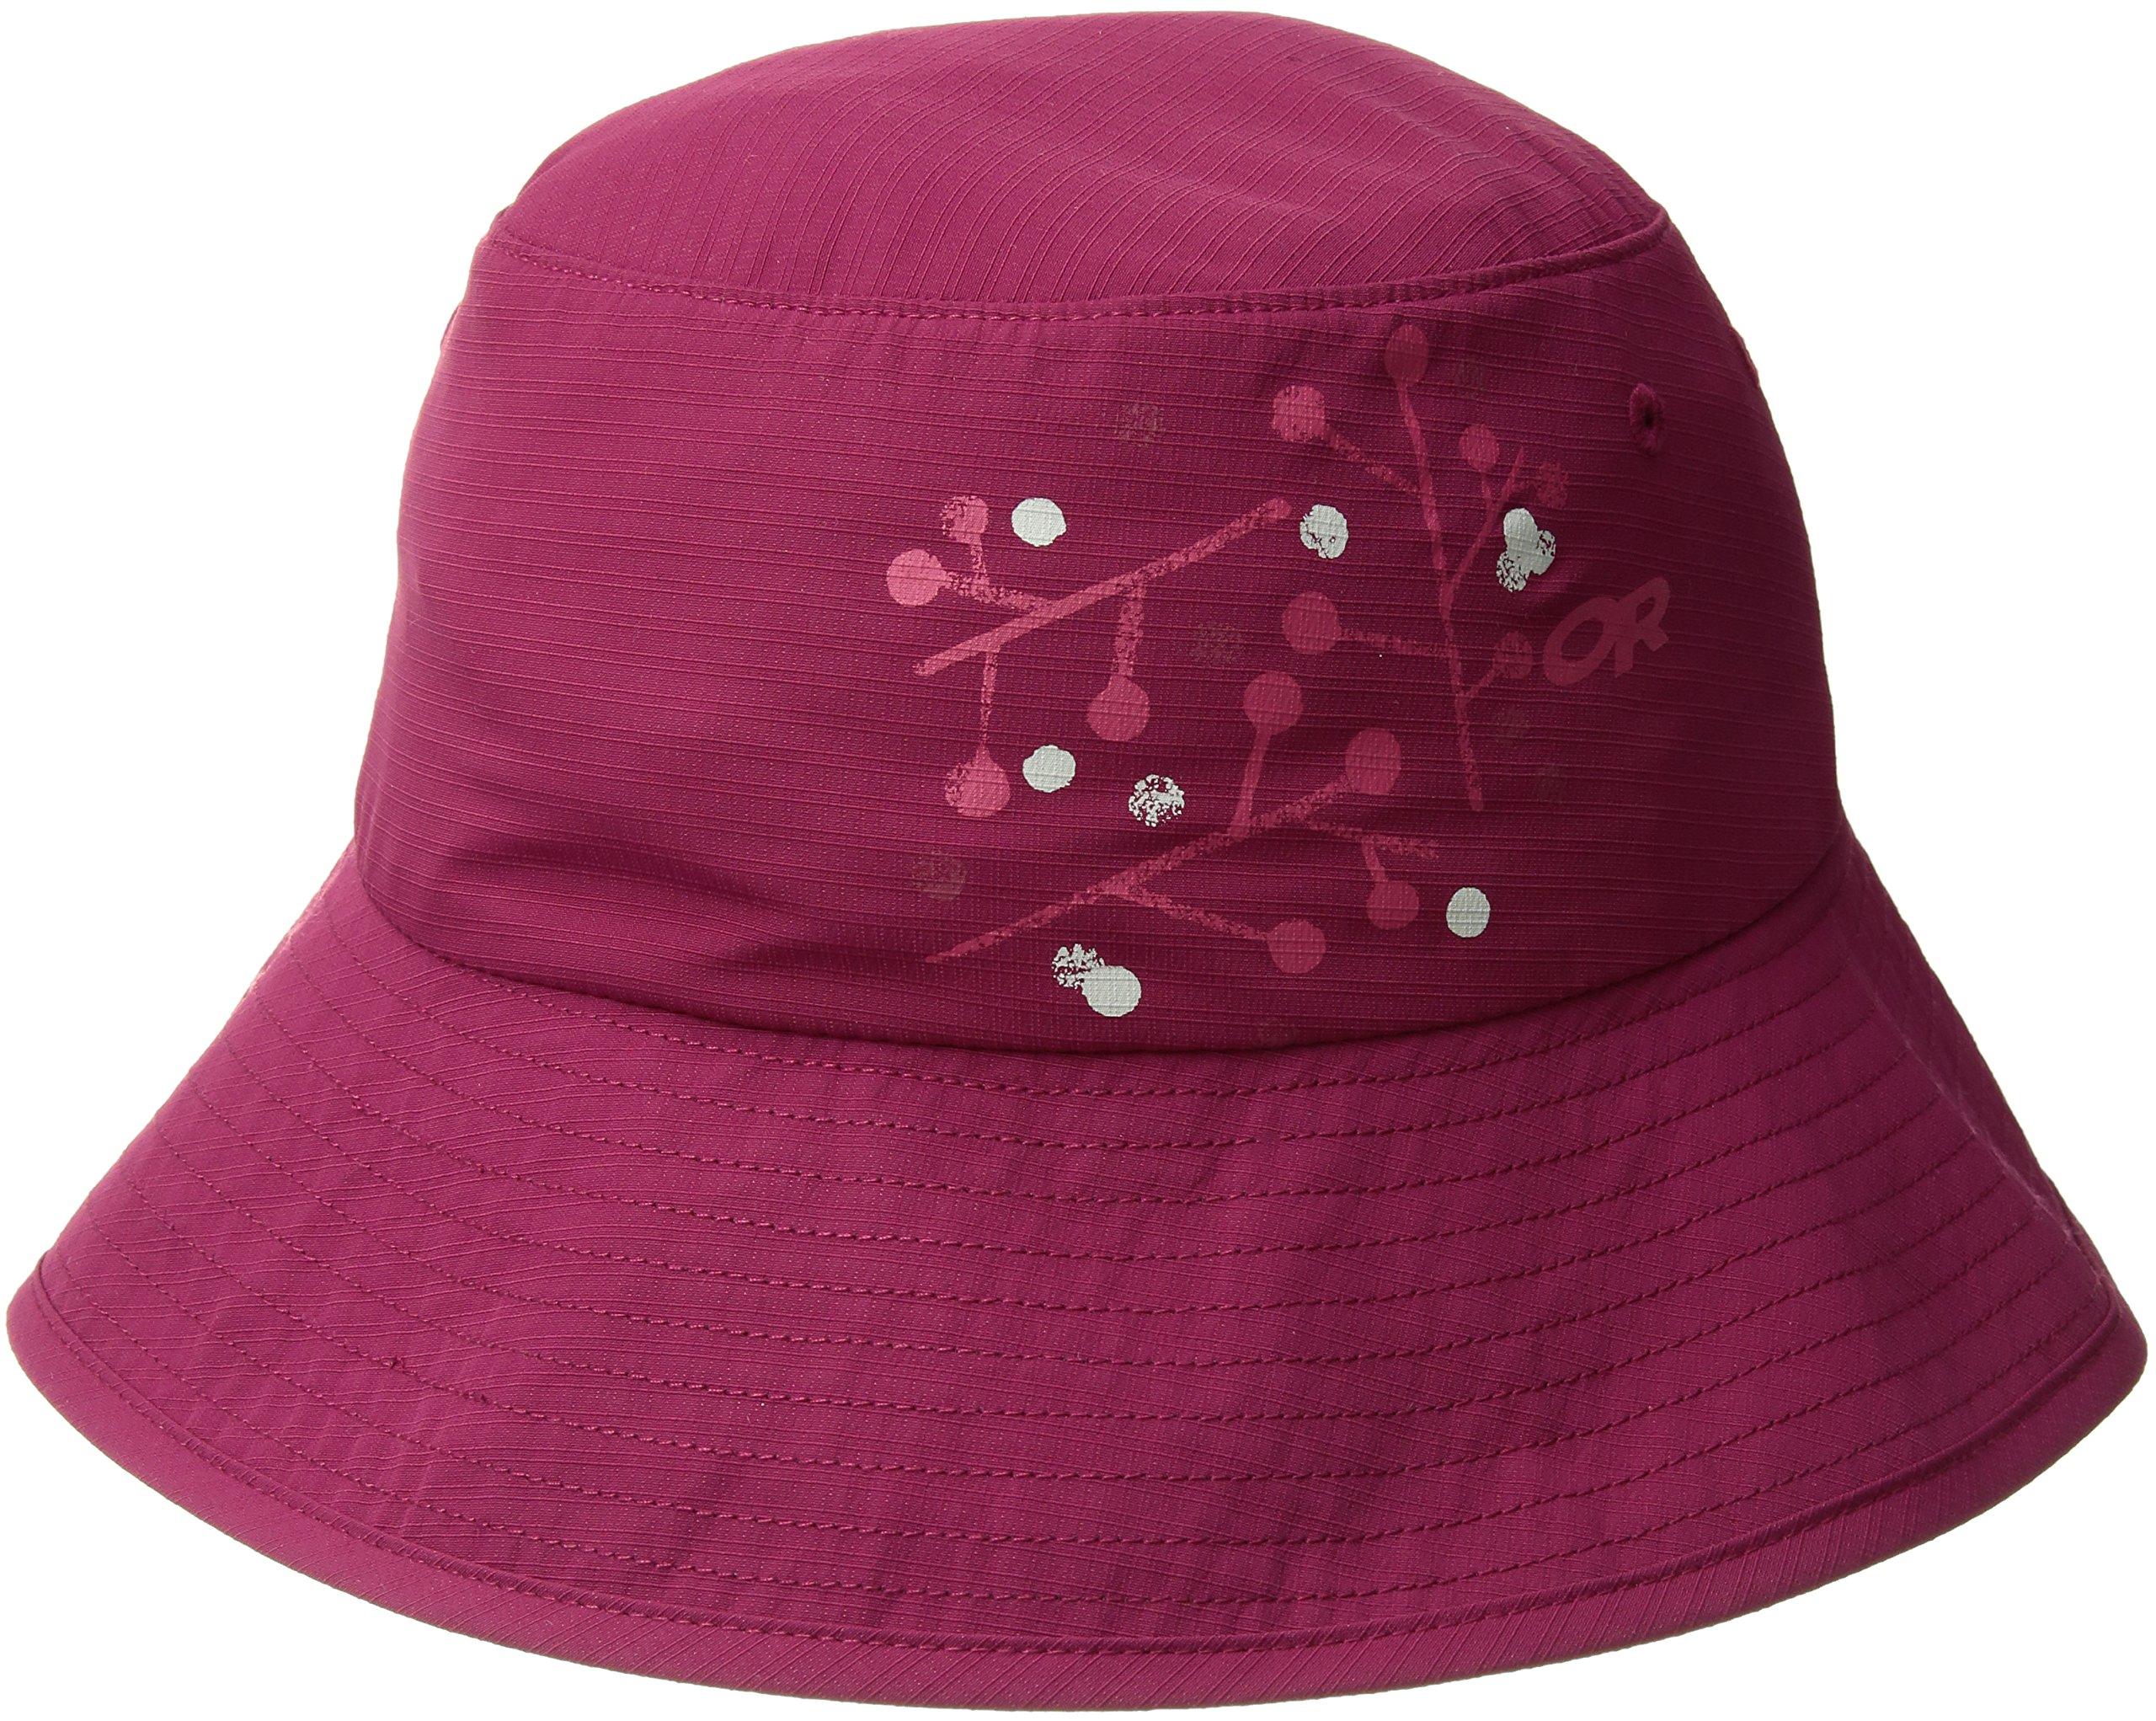 Outdoor Research Women's Solaris Sun Bucket Hat, Raspberry, Large